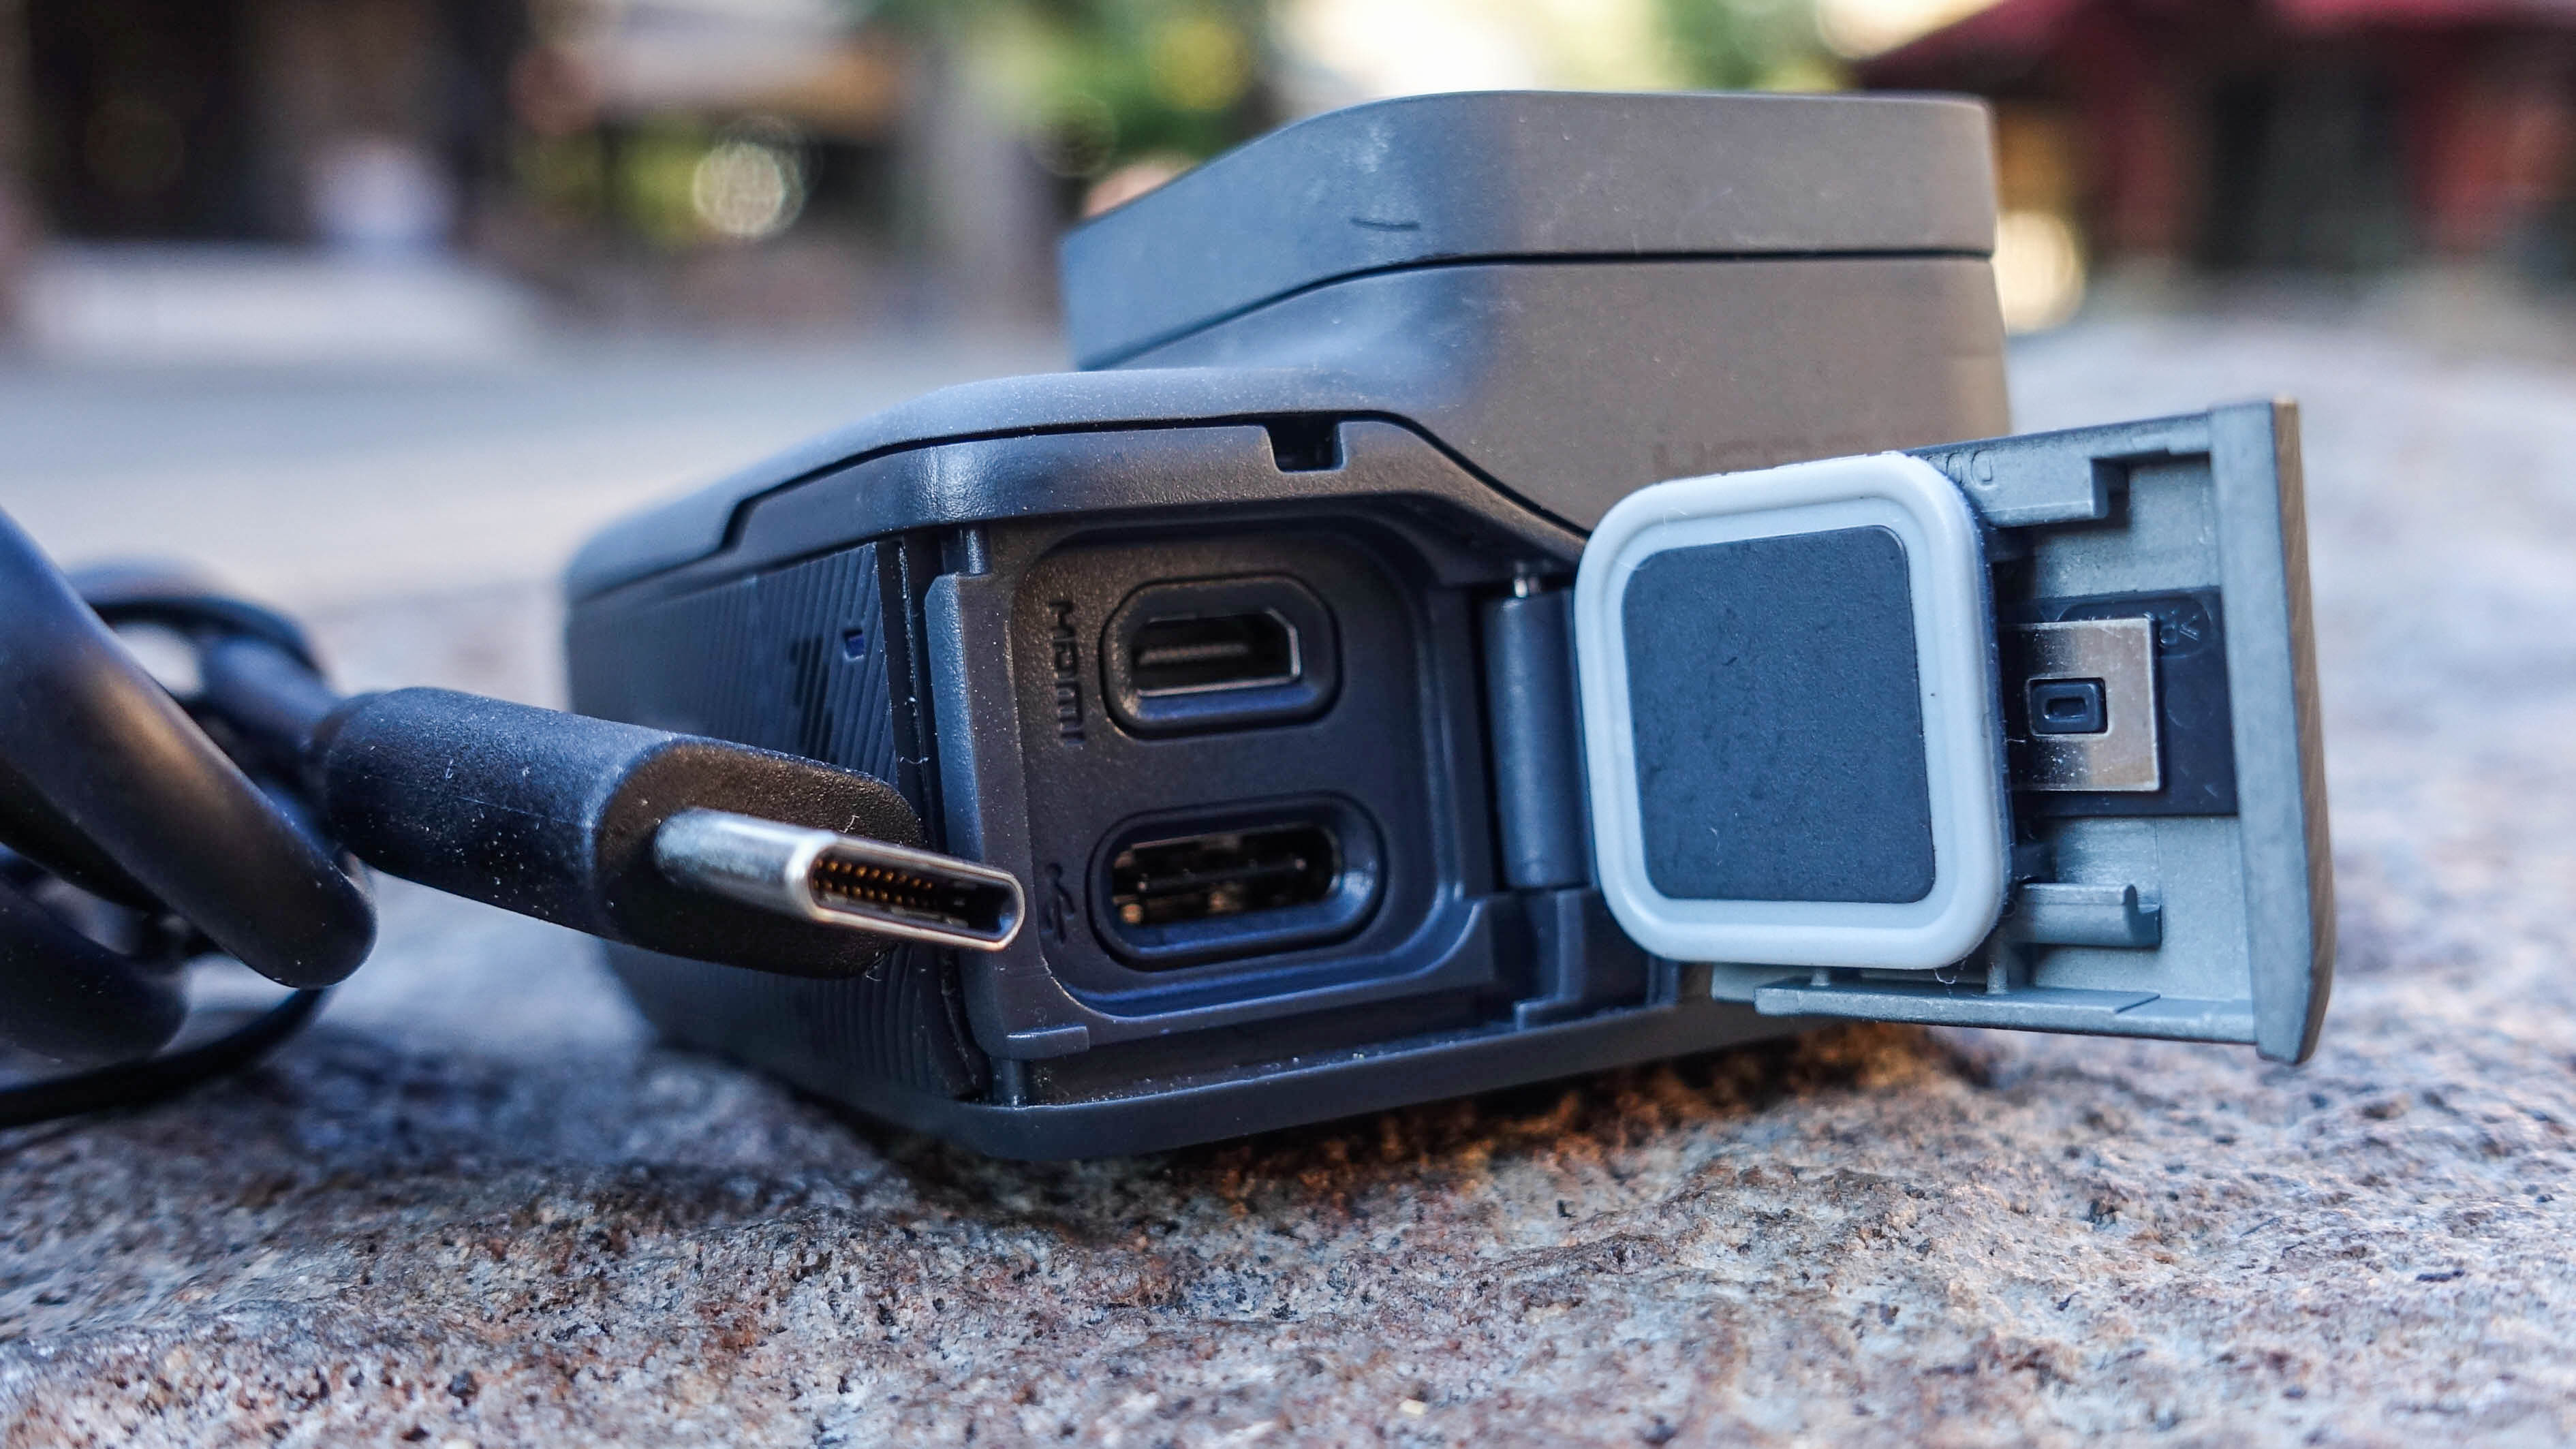 GoPro Hero5 review